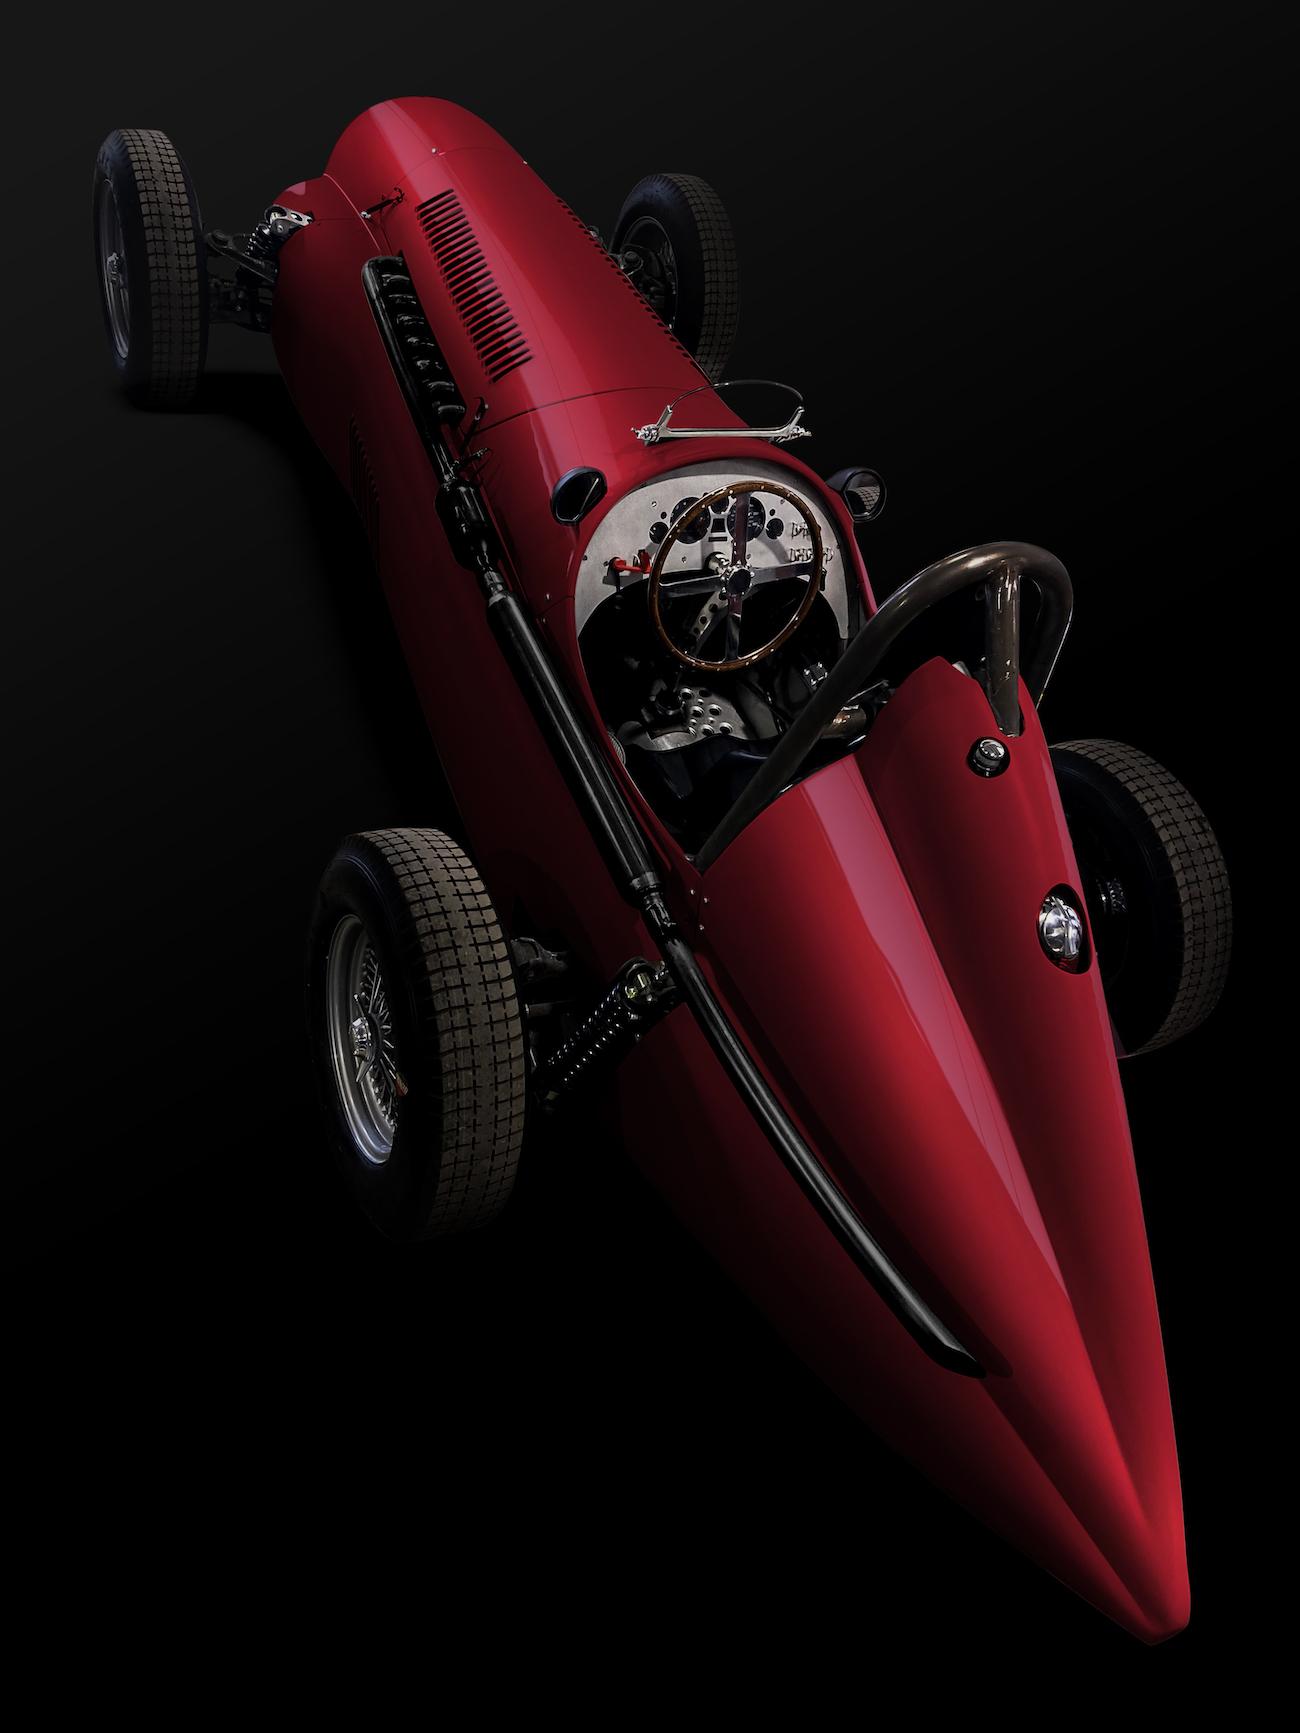 Alfa Romeo Tipo 184 mazda mx5 - 3